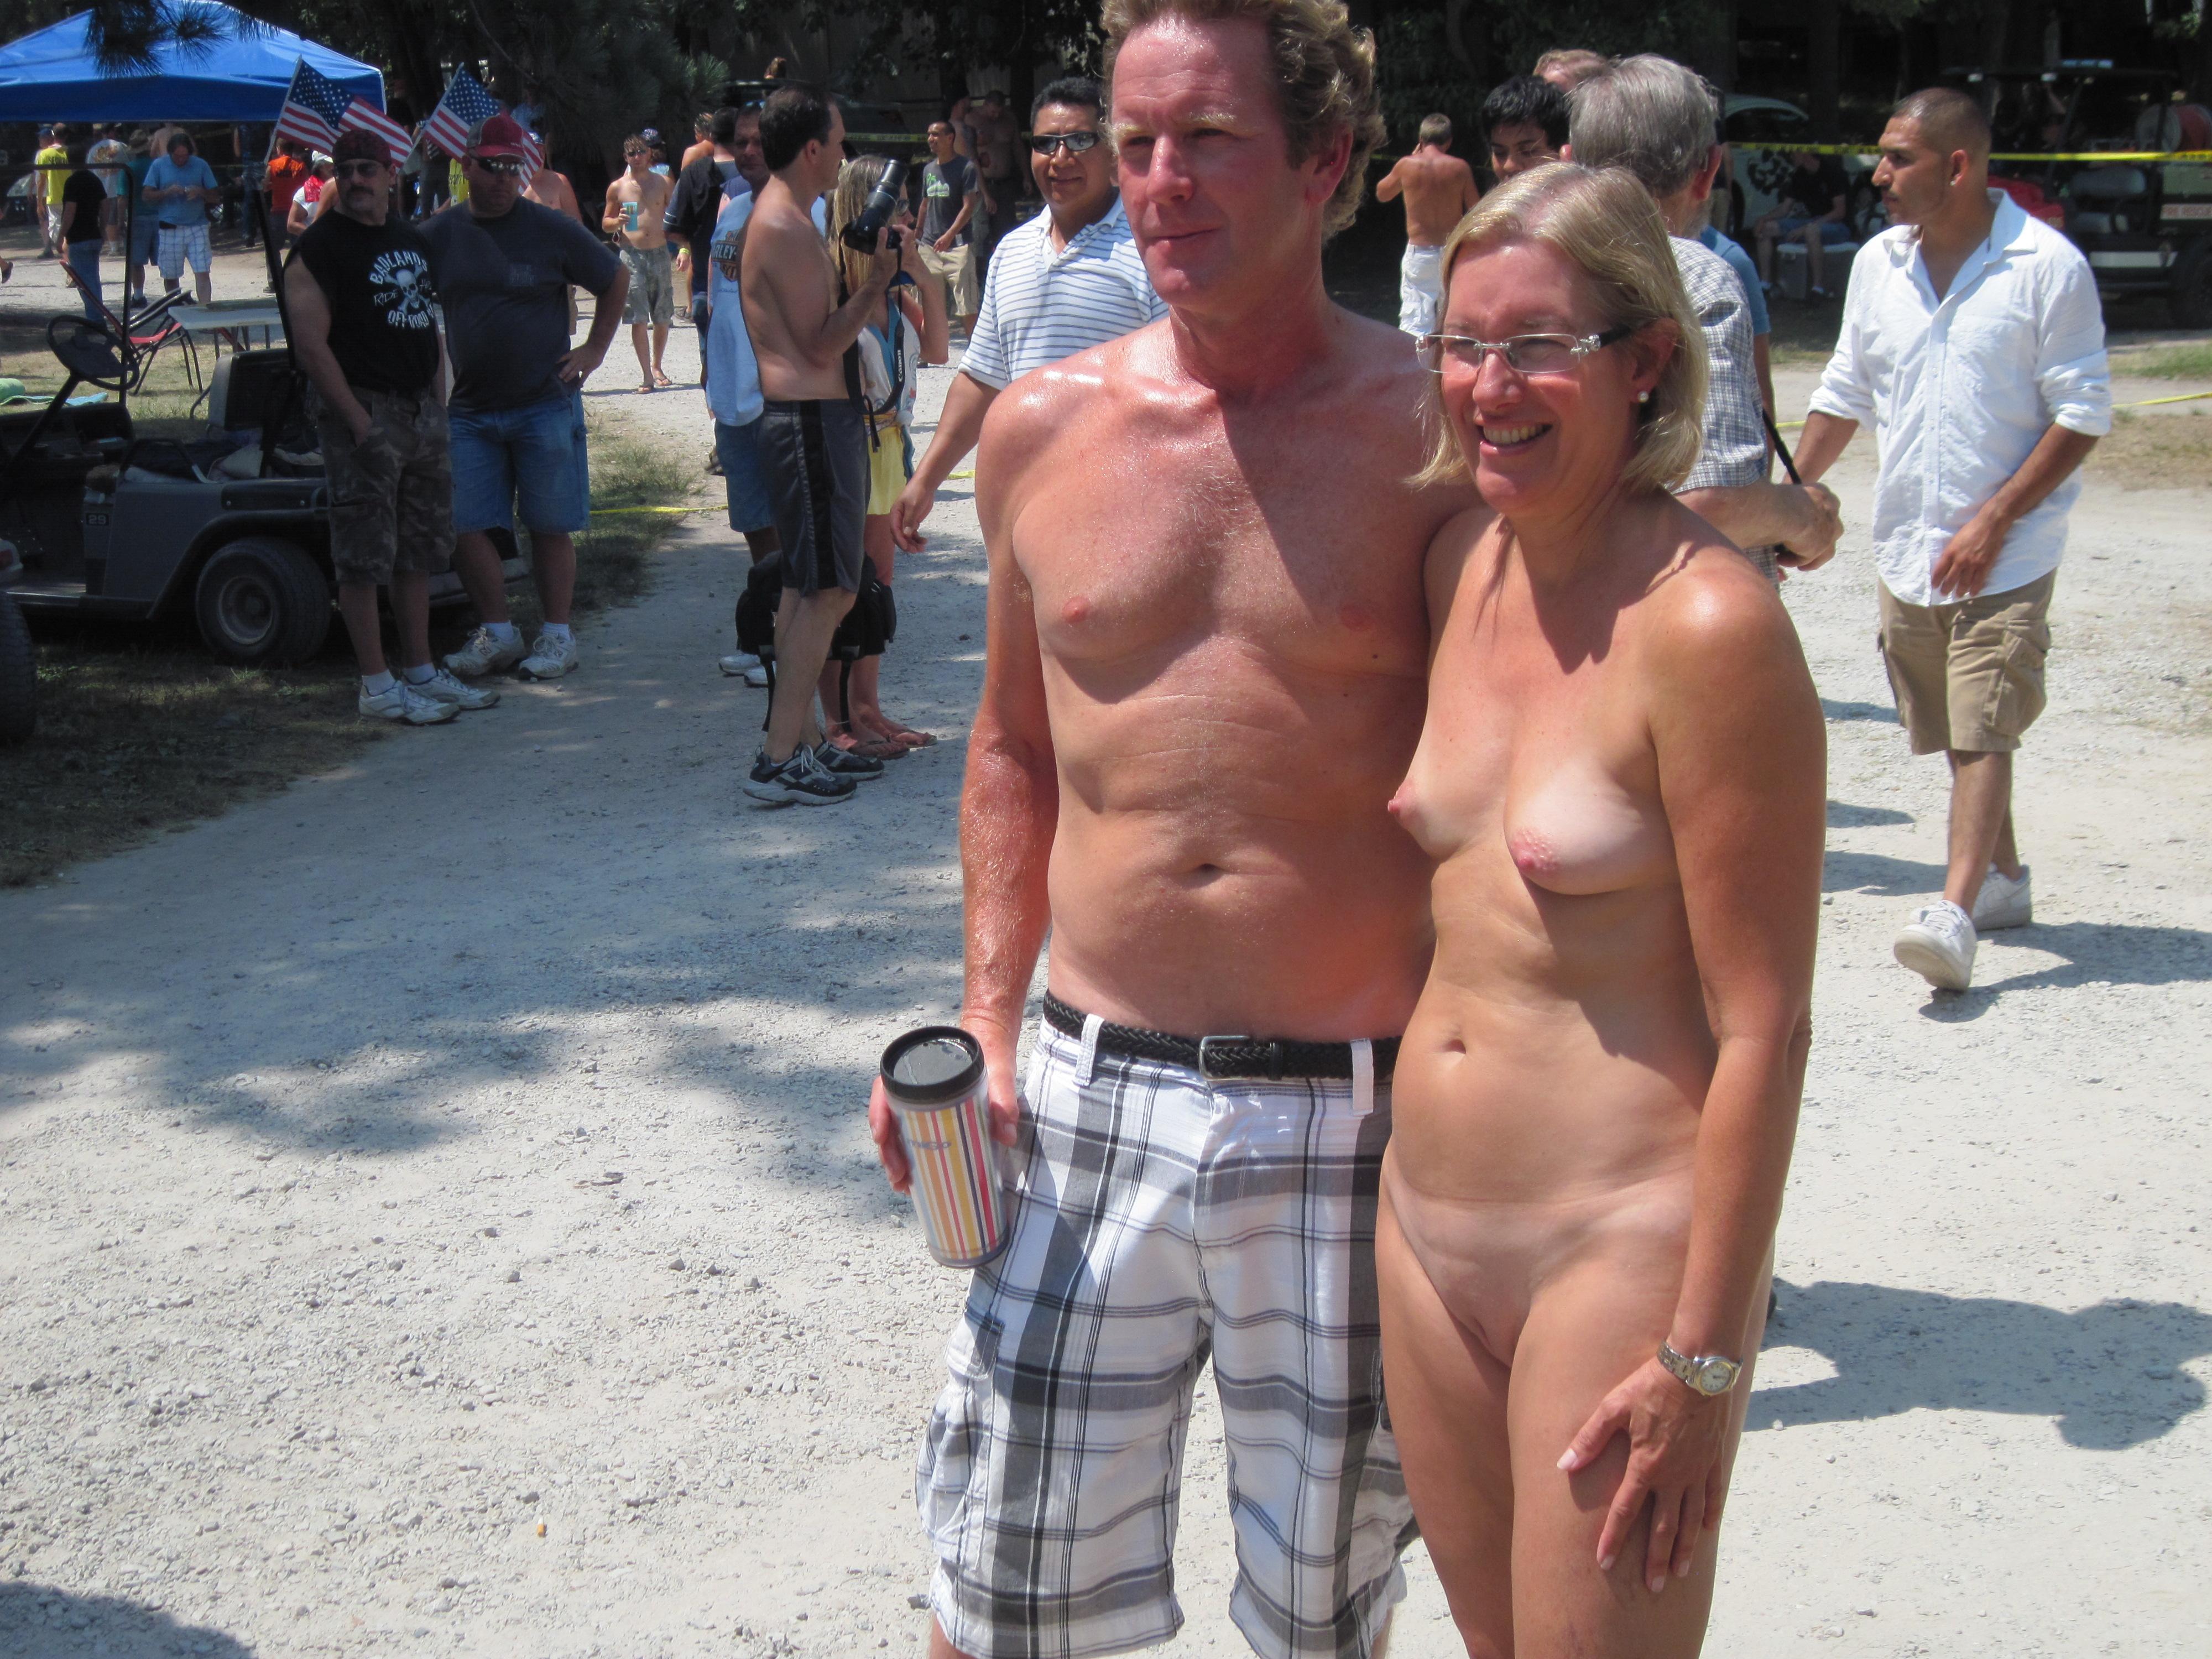 looking at naked man clothed woman